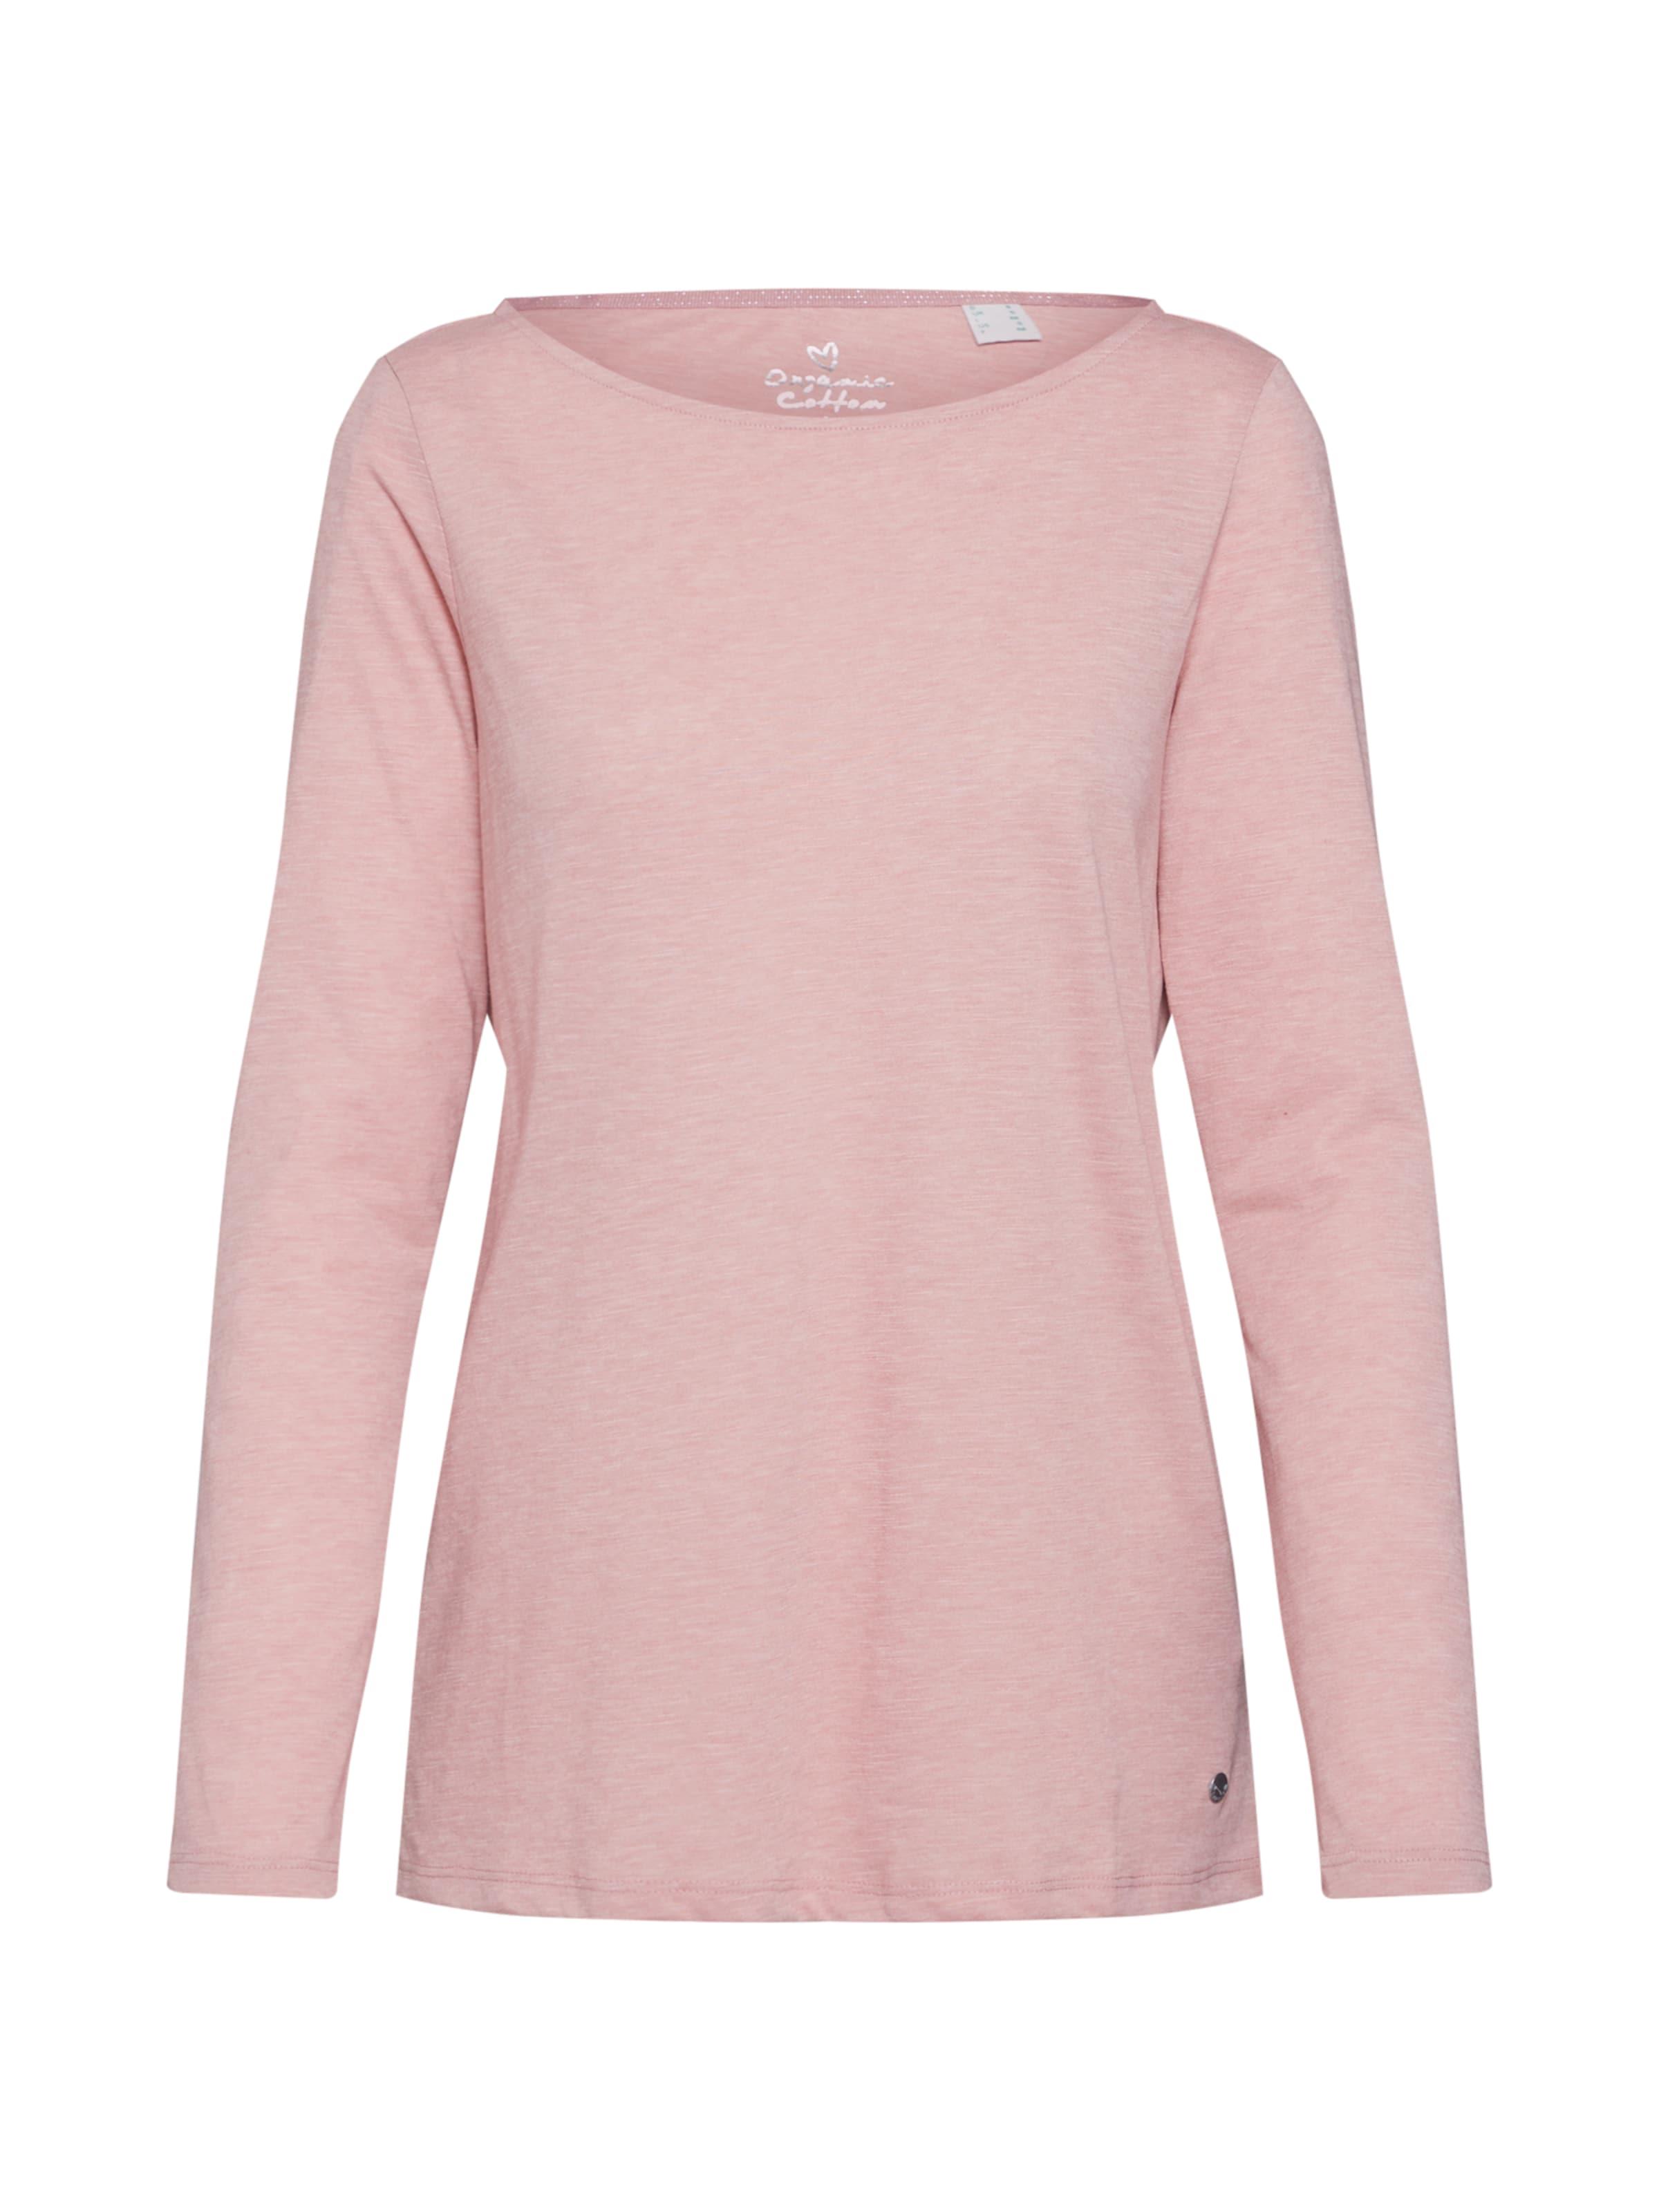 Esprit shirt T Pétrole En f6bgYv7y